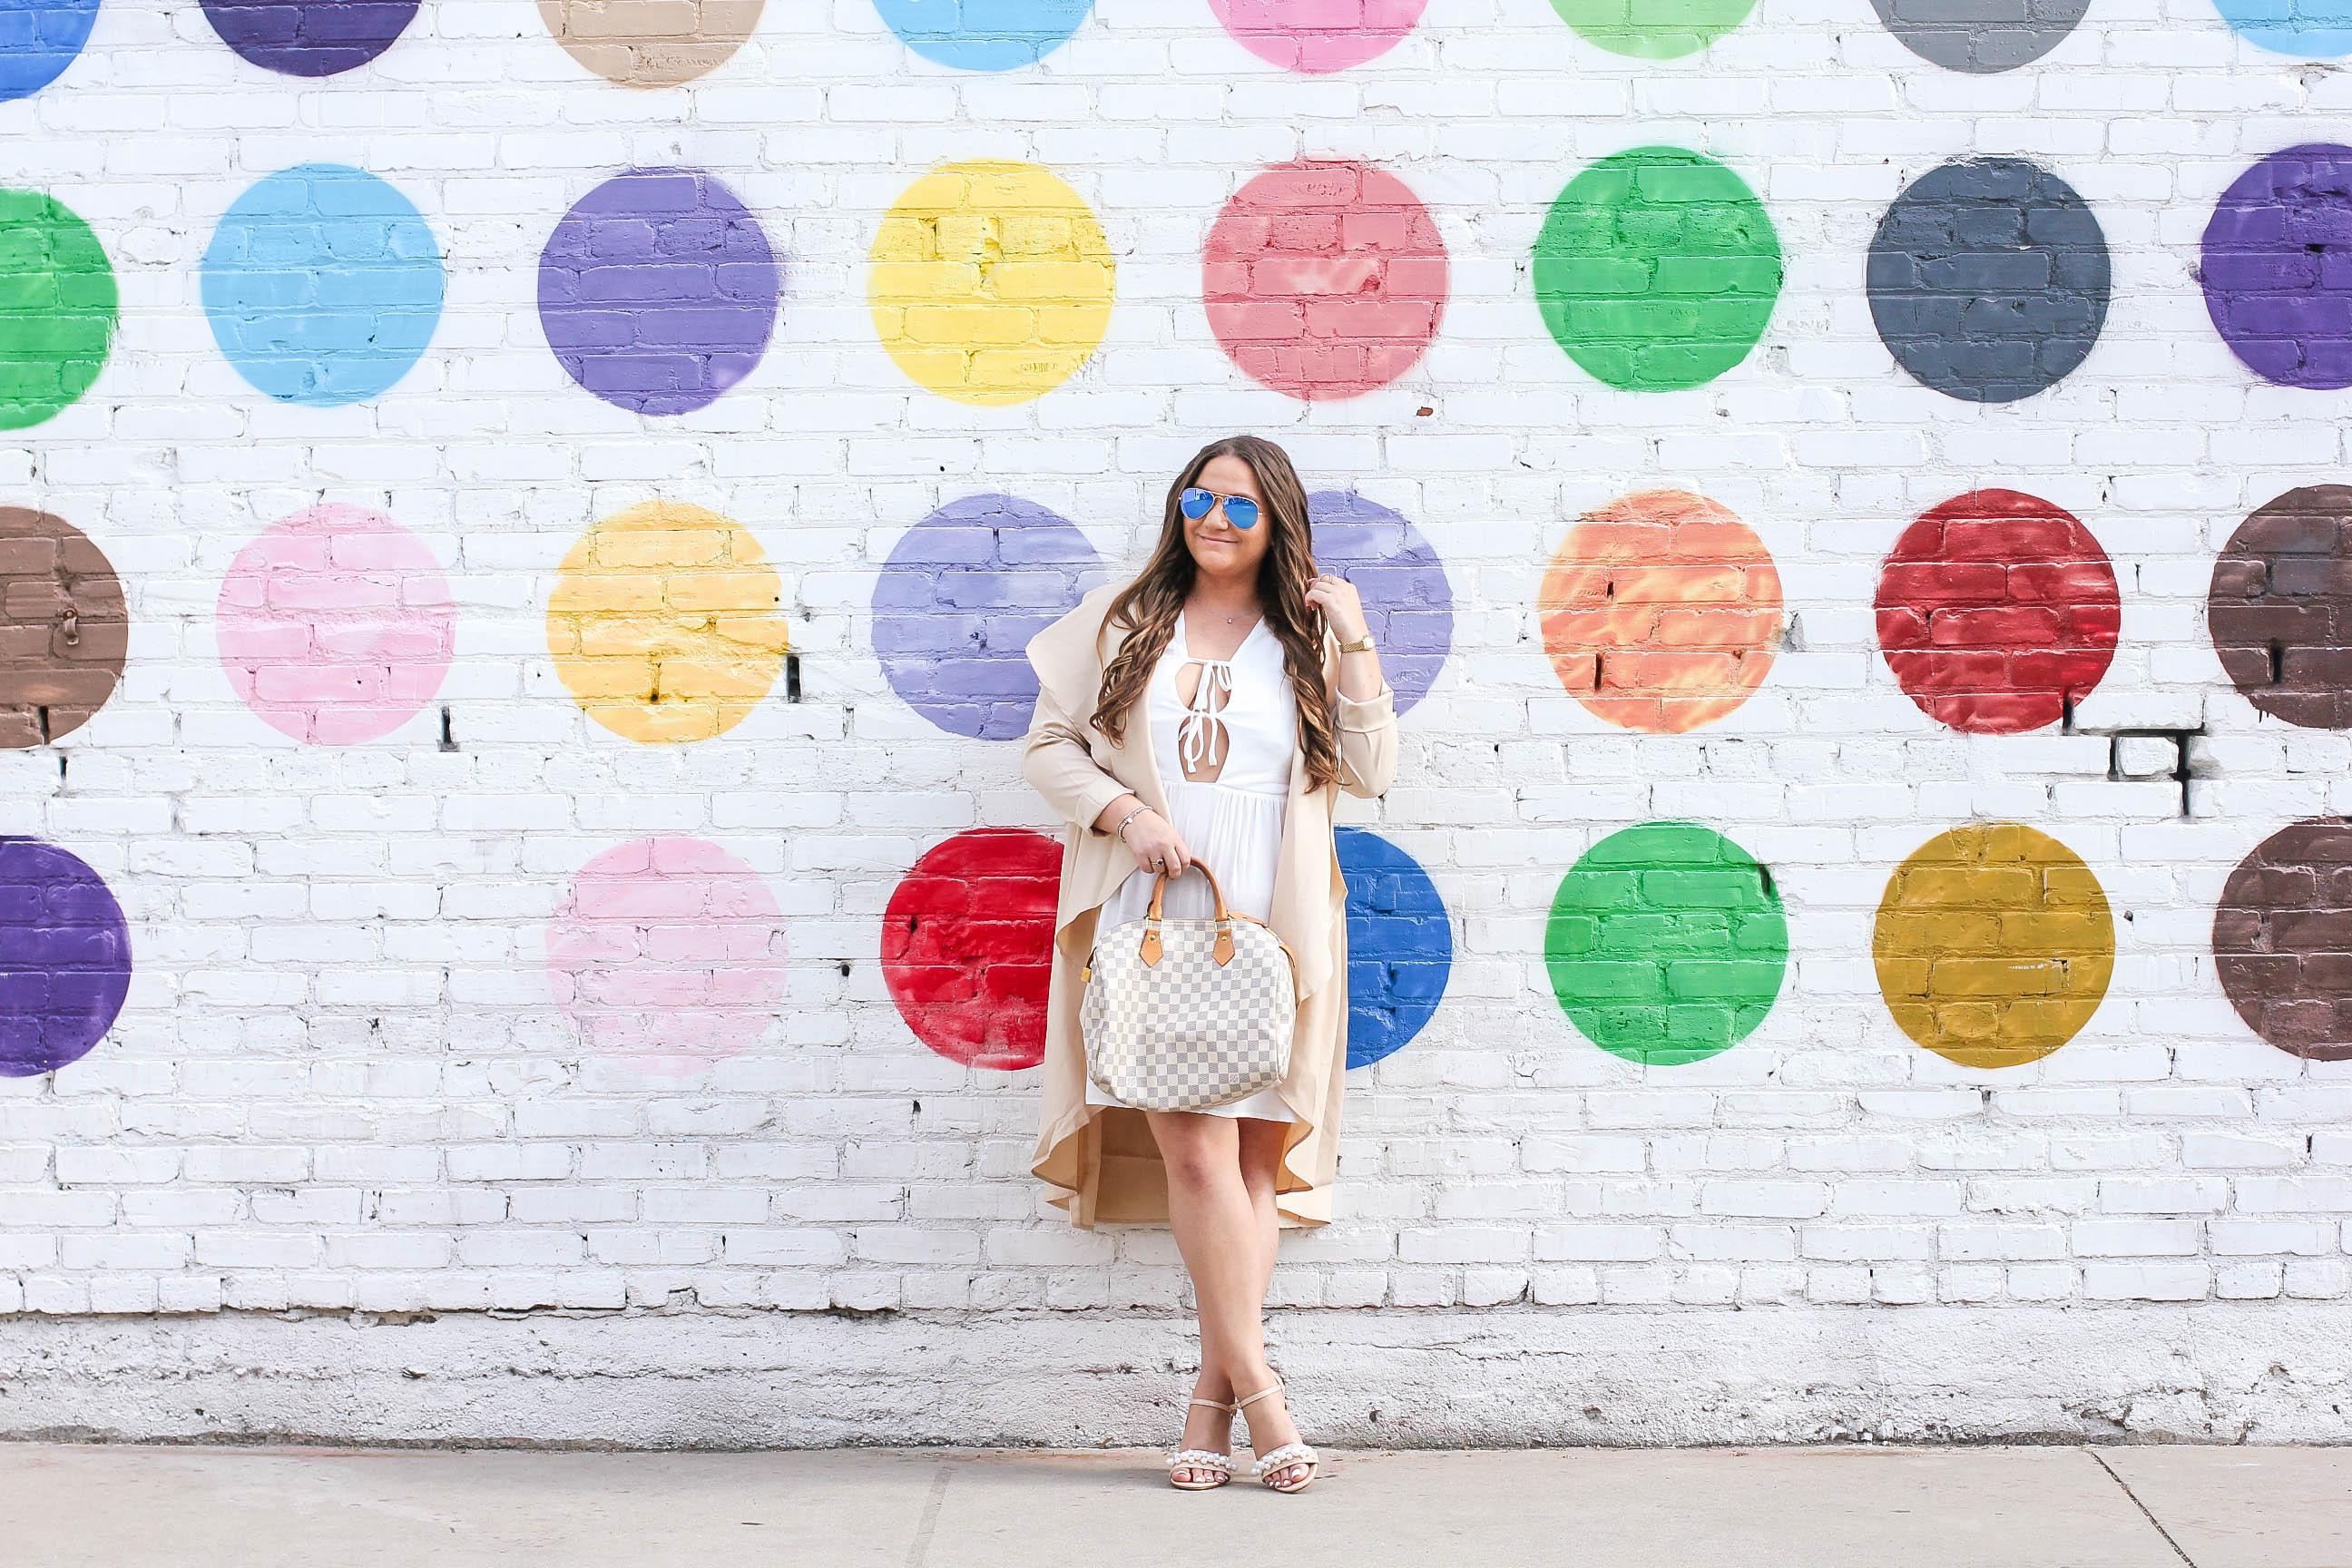 missyonmadison, missyonmadison instagram, melissa tierney, la blogger, fashion blogger, wall charades, studio diy wall crawl, polka dot wall, dtla polka dot wall, the springs la, ami clubwear, ankle strap heels, nude ankle strap sandals, louis vuitton speedy bag, raybans, white dress, white plunge dress, tan trench coat, trench coat, pearl heels, bloglovin, style blogger, street style,